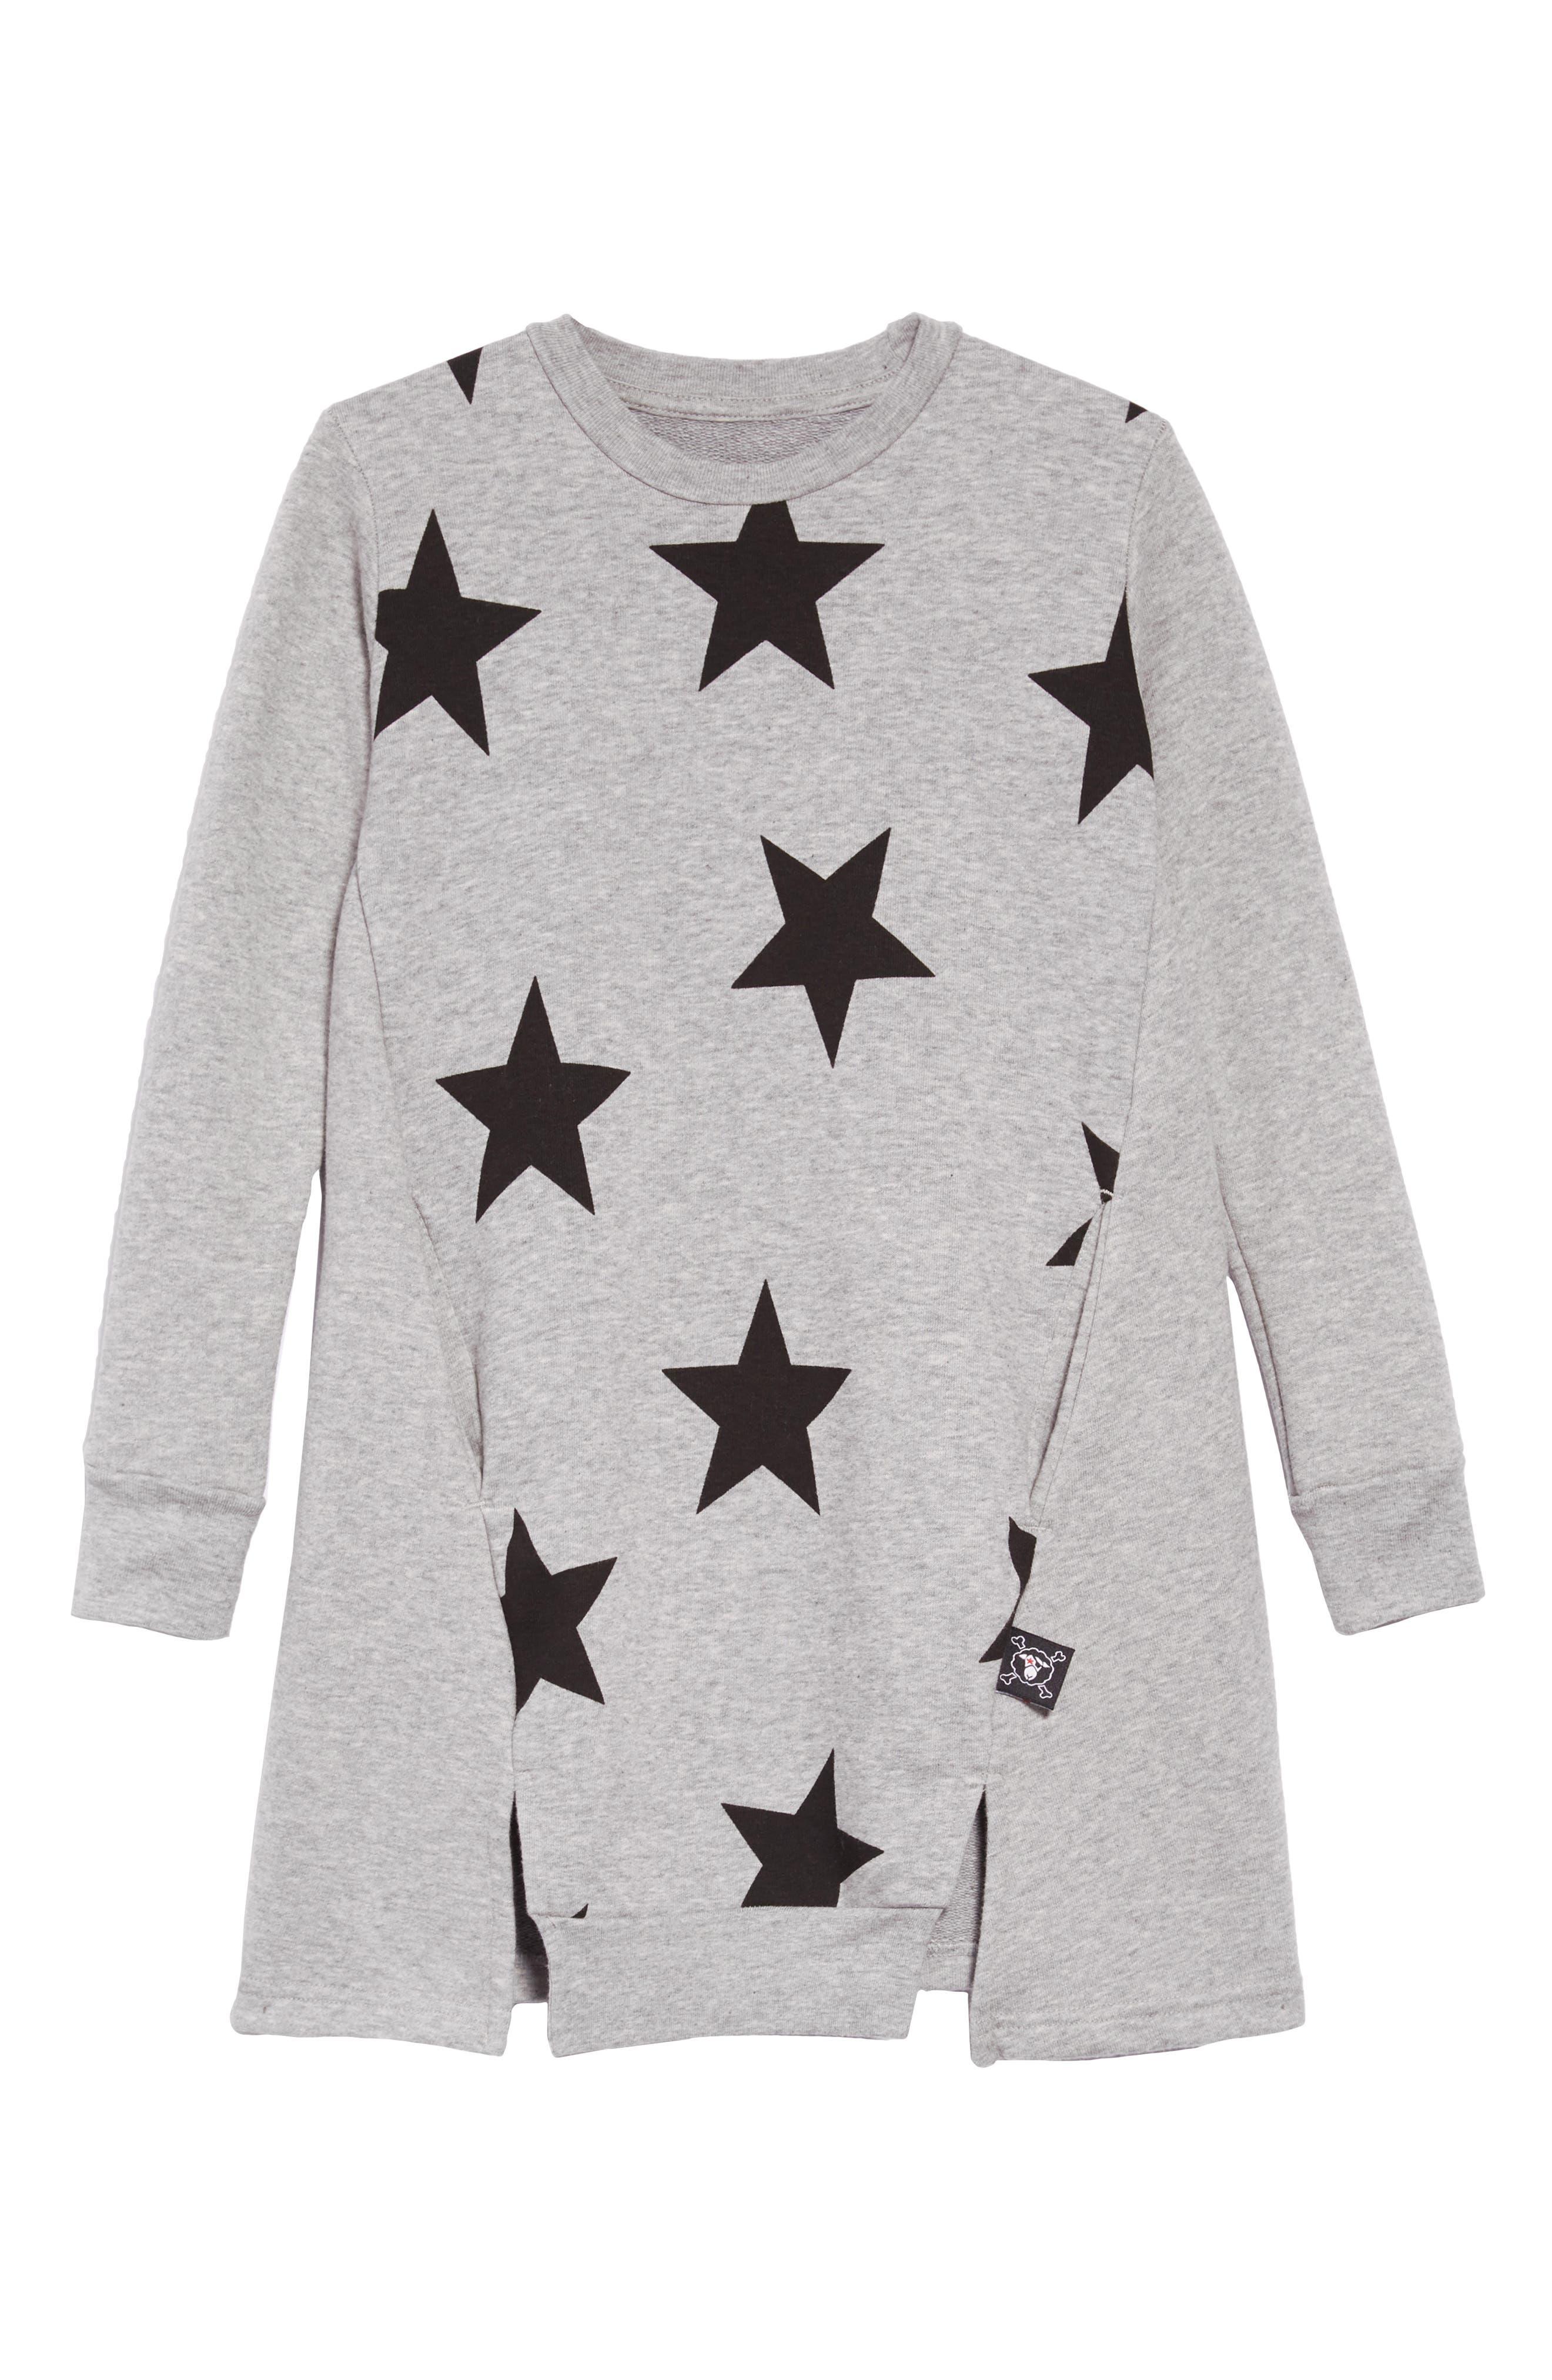 Star A Dress,                         Main,                         color, 050